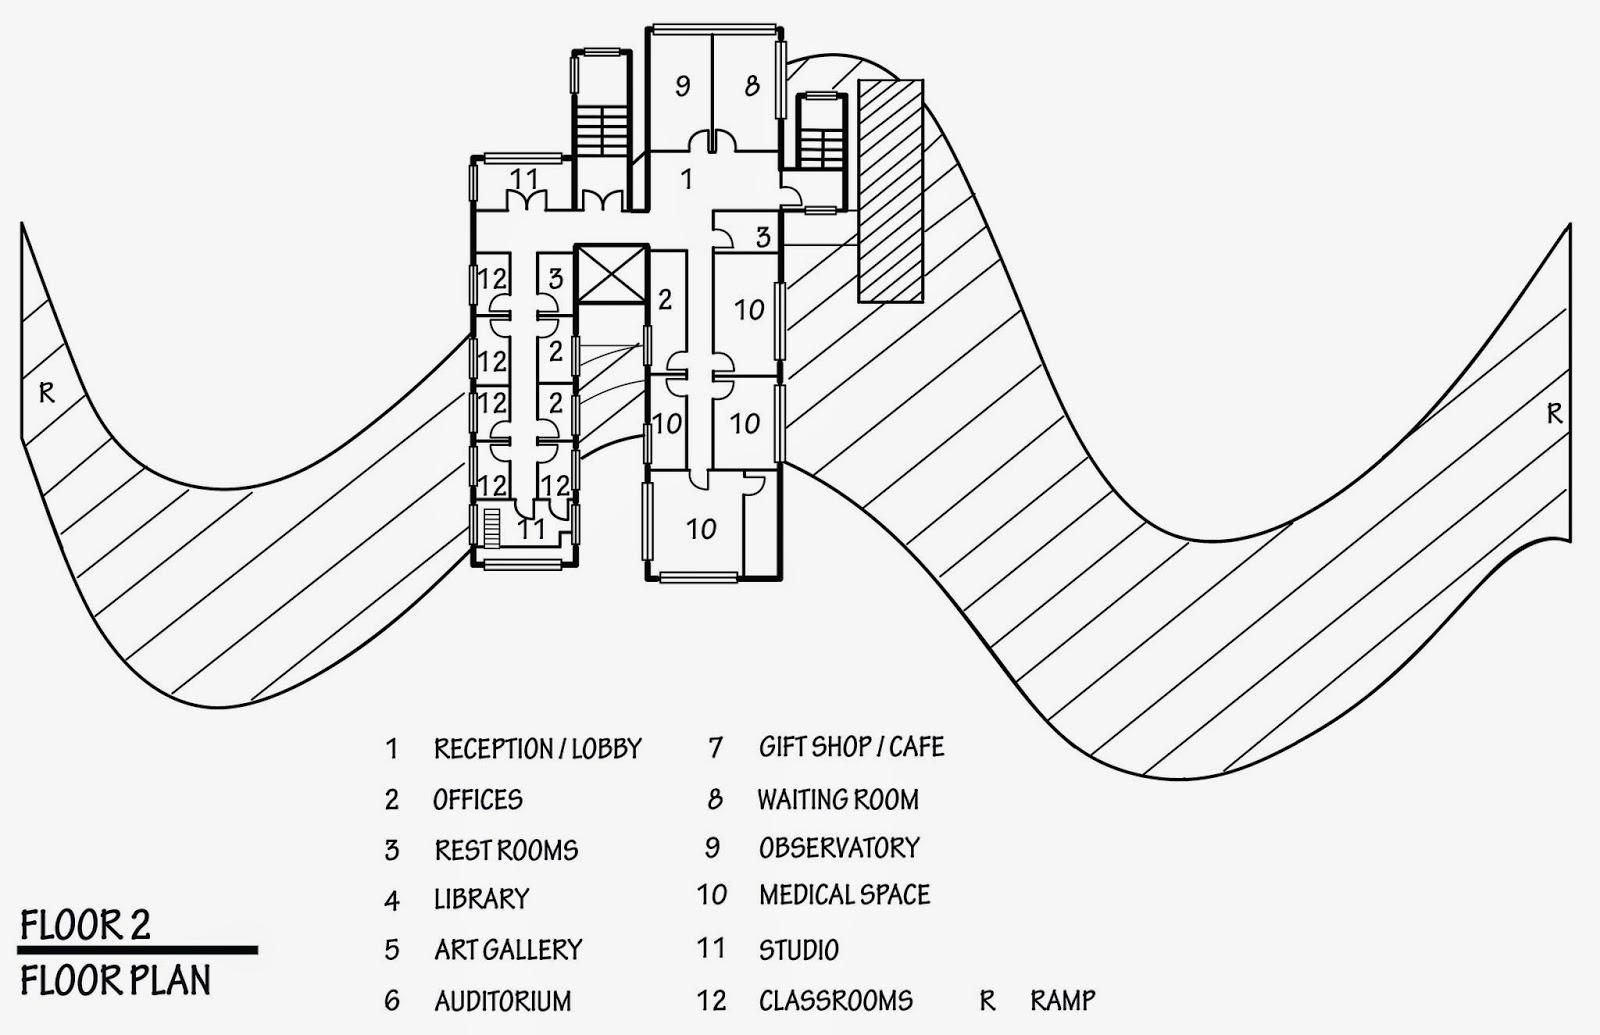 ARCH3610S2014BKAUR: FINAL FLOOR PLANS